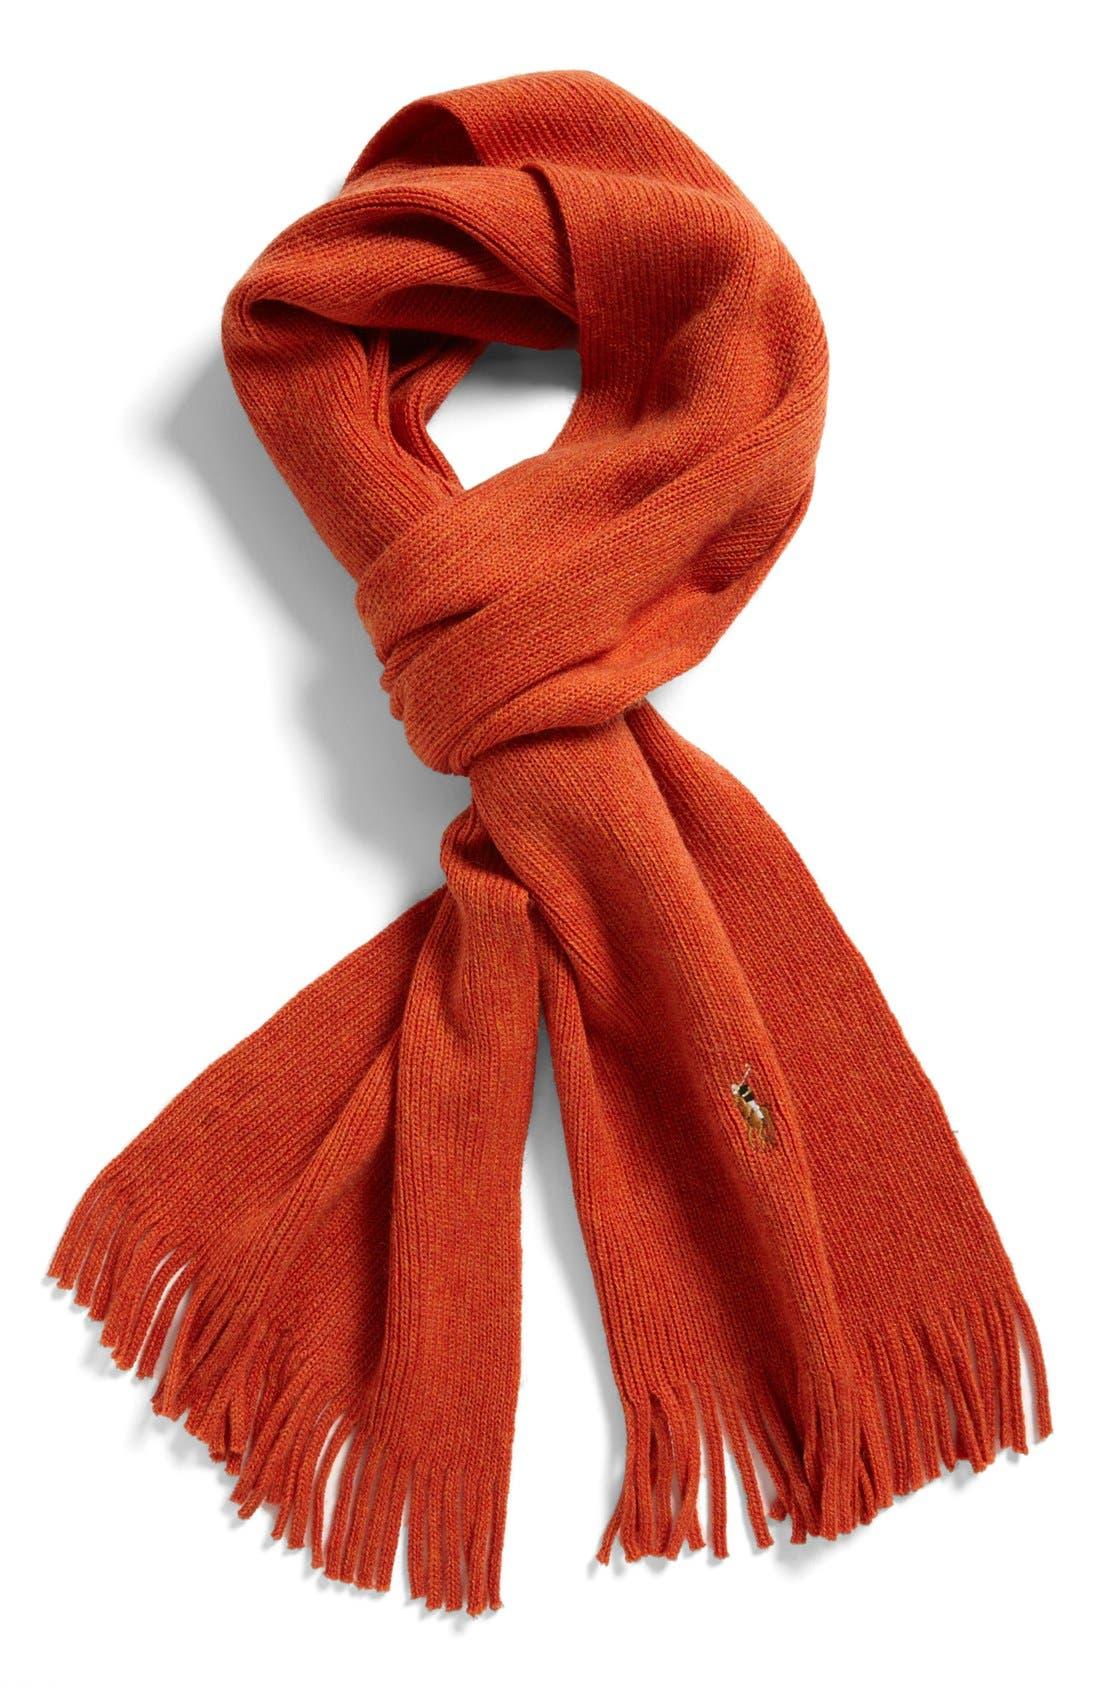 Alternate Image 1 Selected - Polo Ralph Lauren Merino Wool Scarf